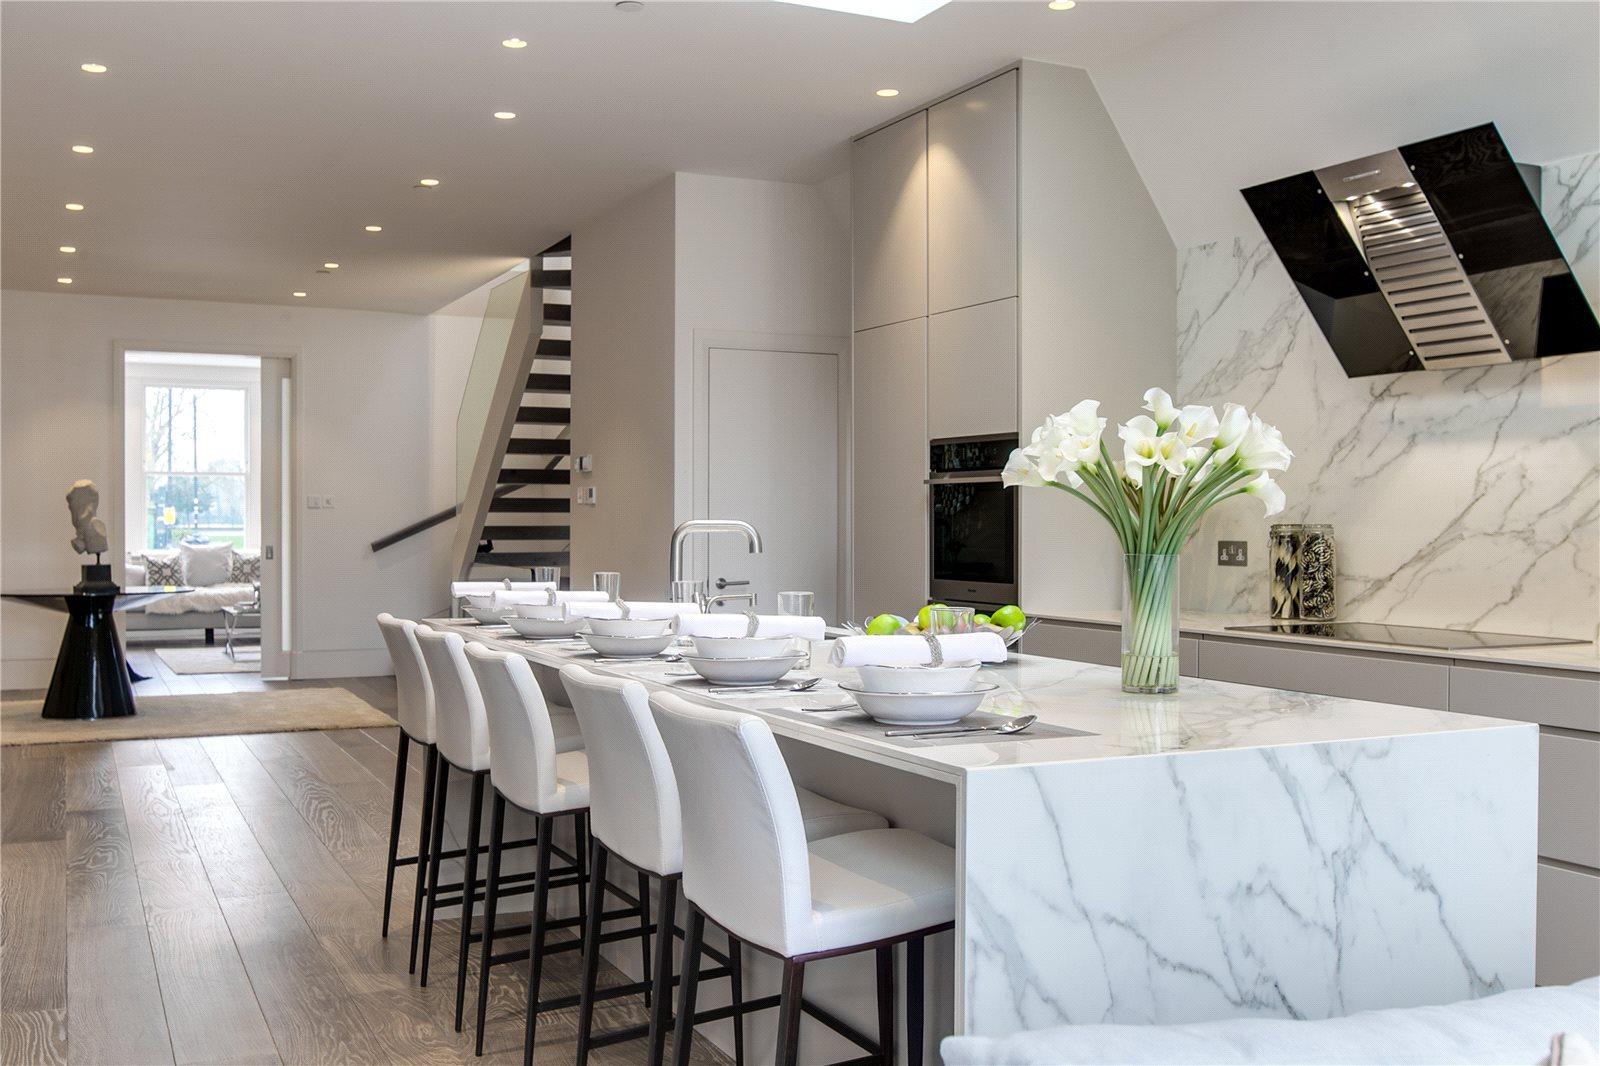 Full House Extension Builders In Kensington Chelsea House